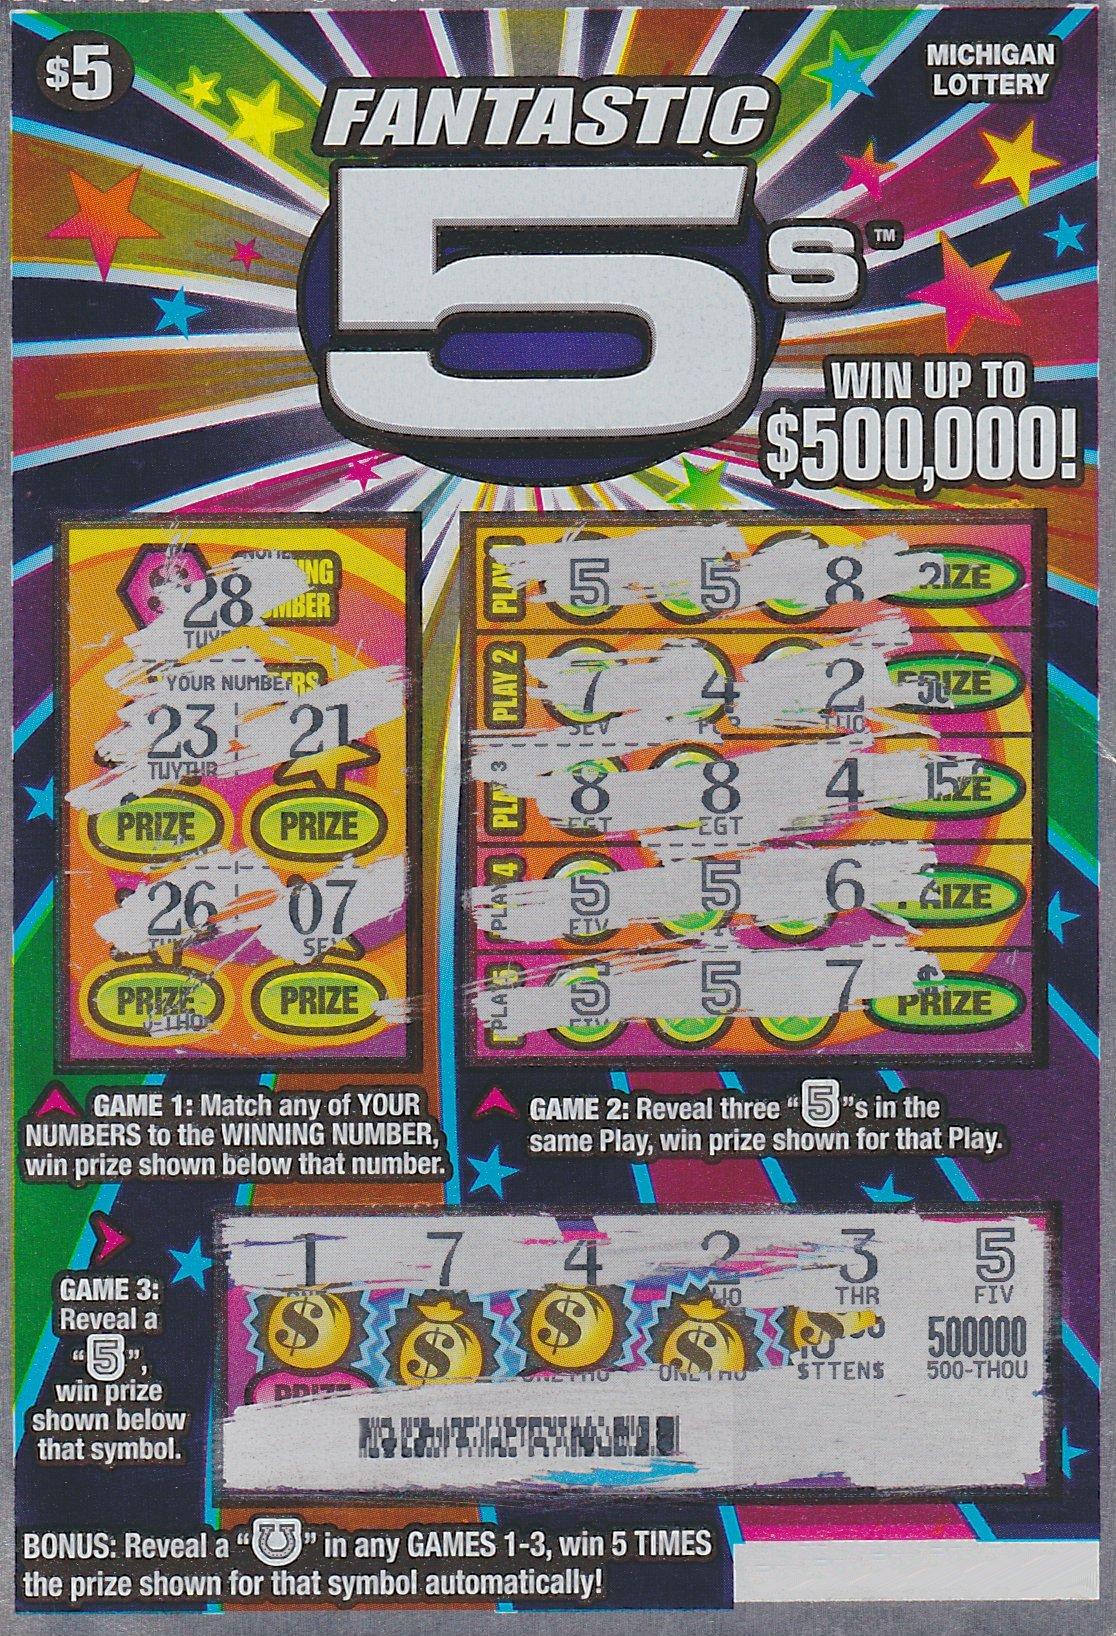 Wayne County Man Wins 500 000 From Michigan Lottery